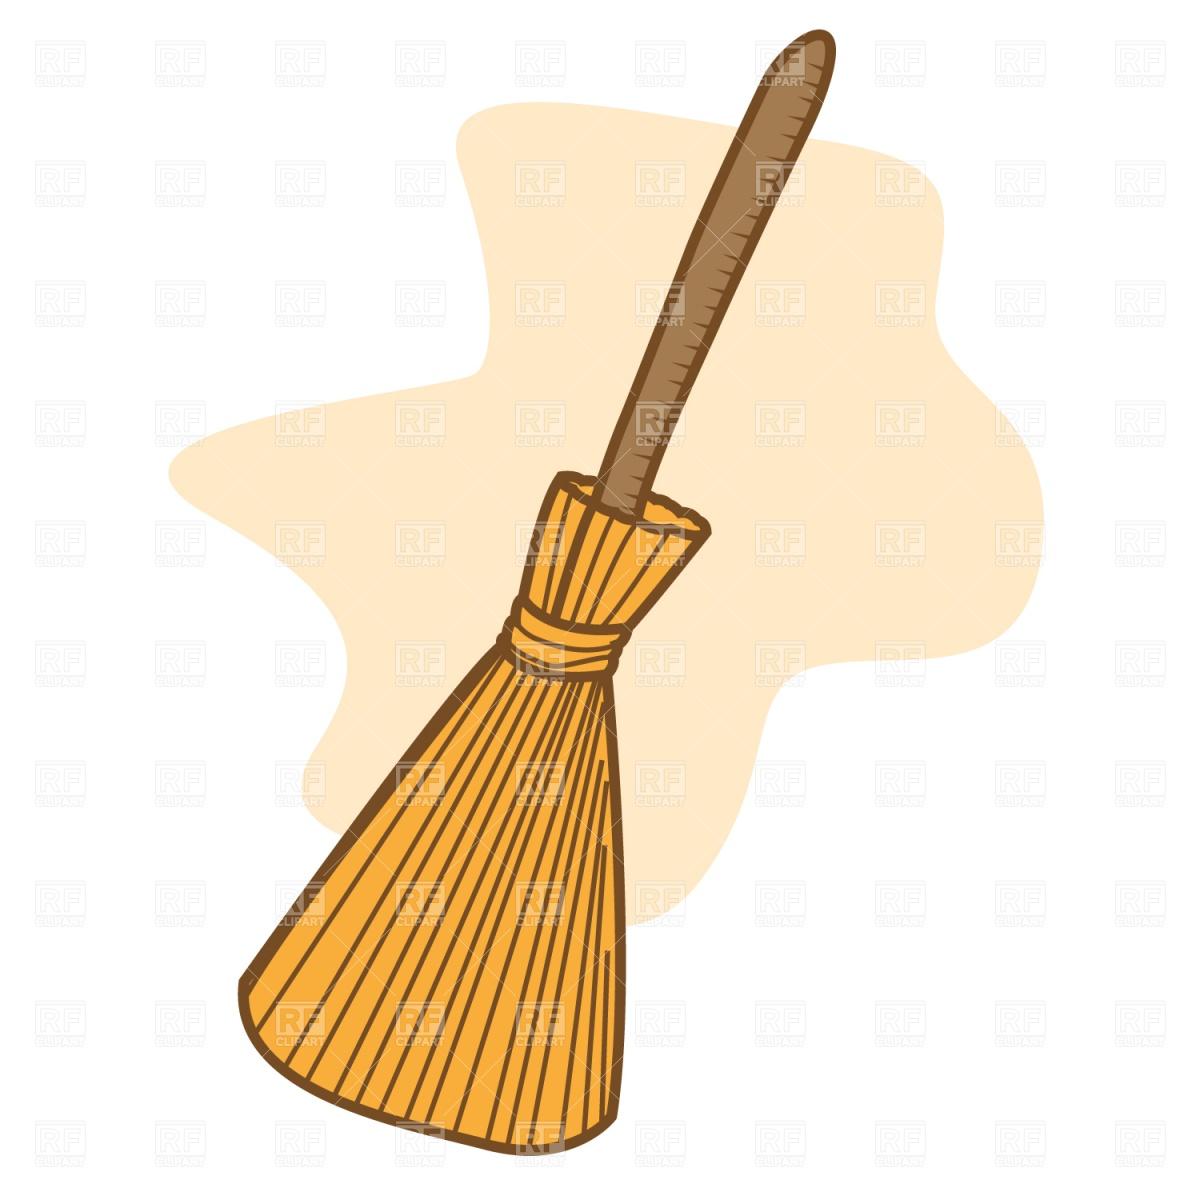 Broom Vector Image #1563.